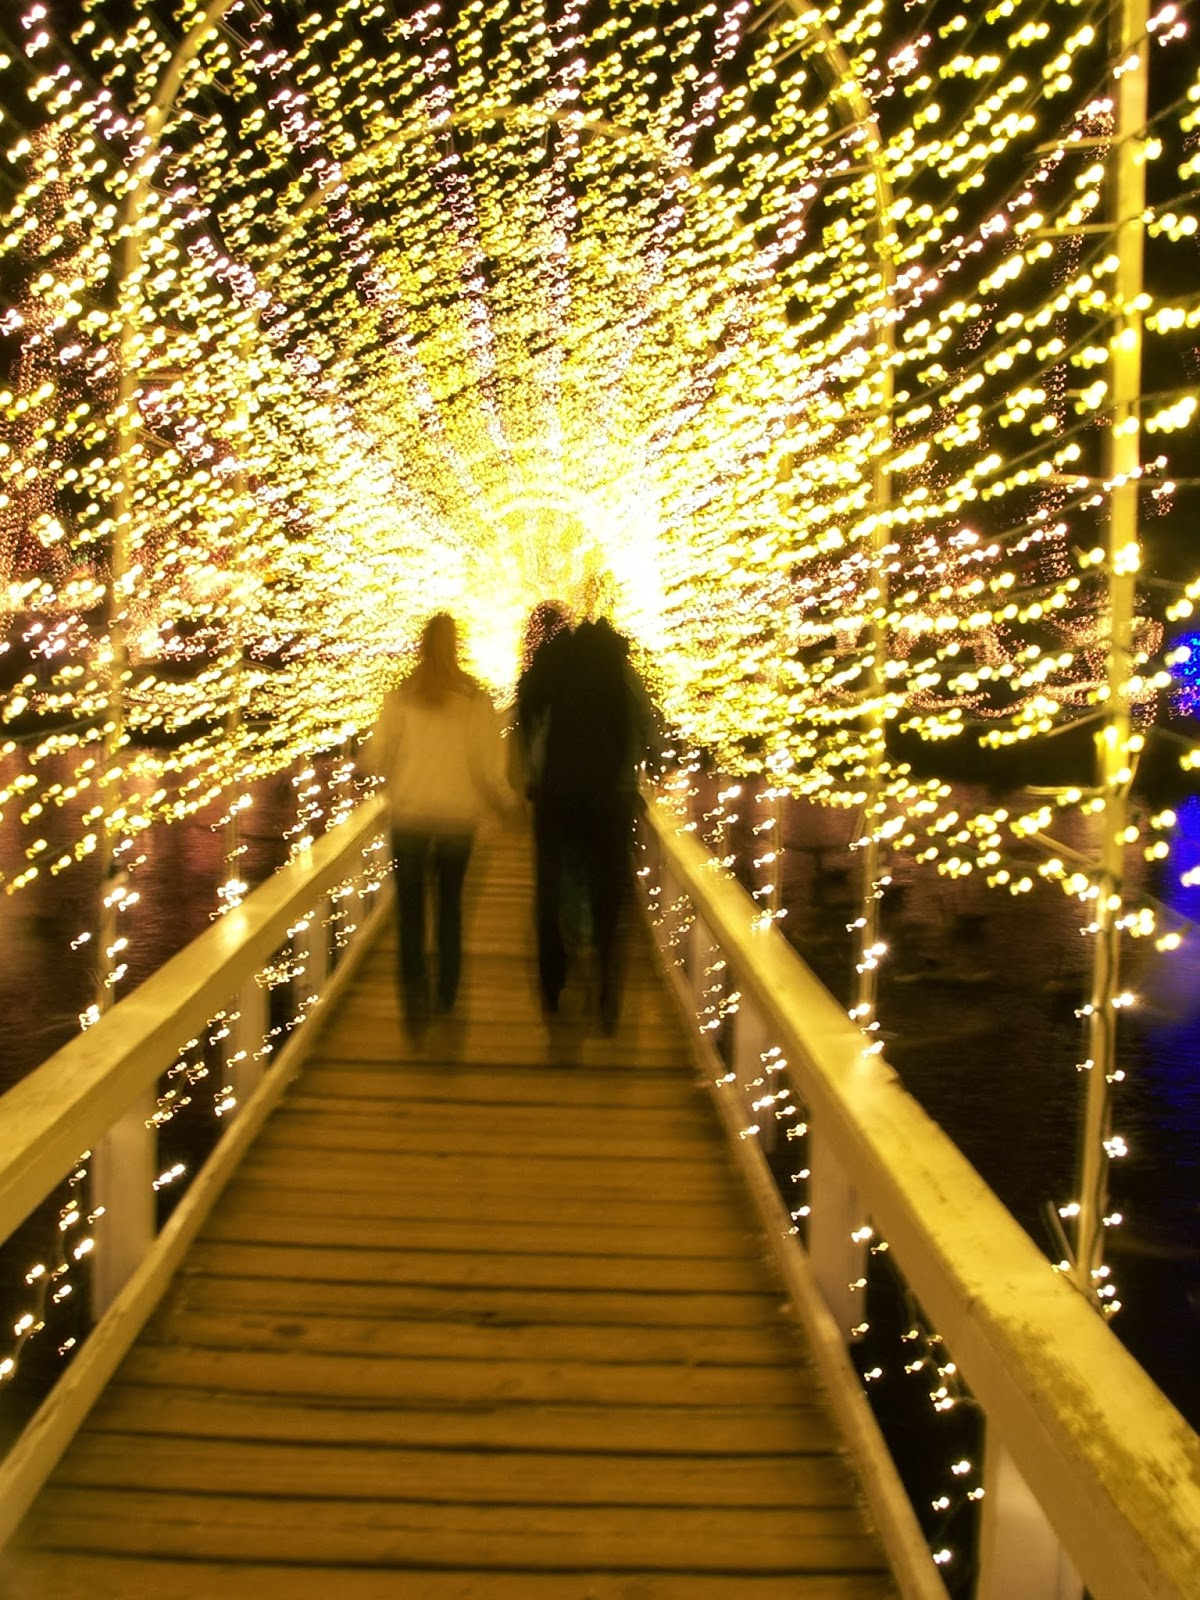 Texasdaisey Creations: Festival of Lights